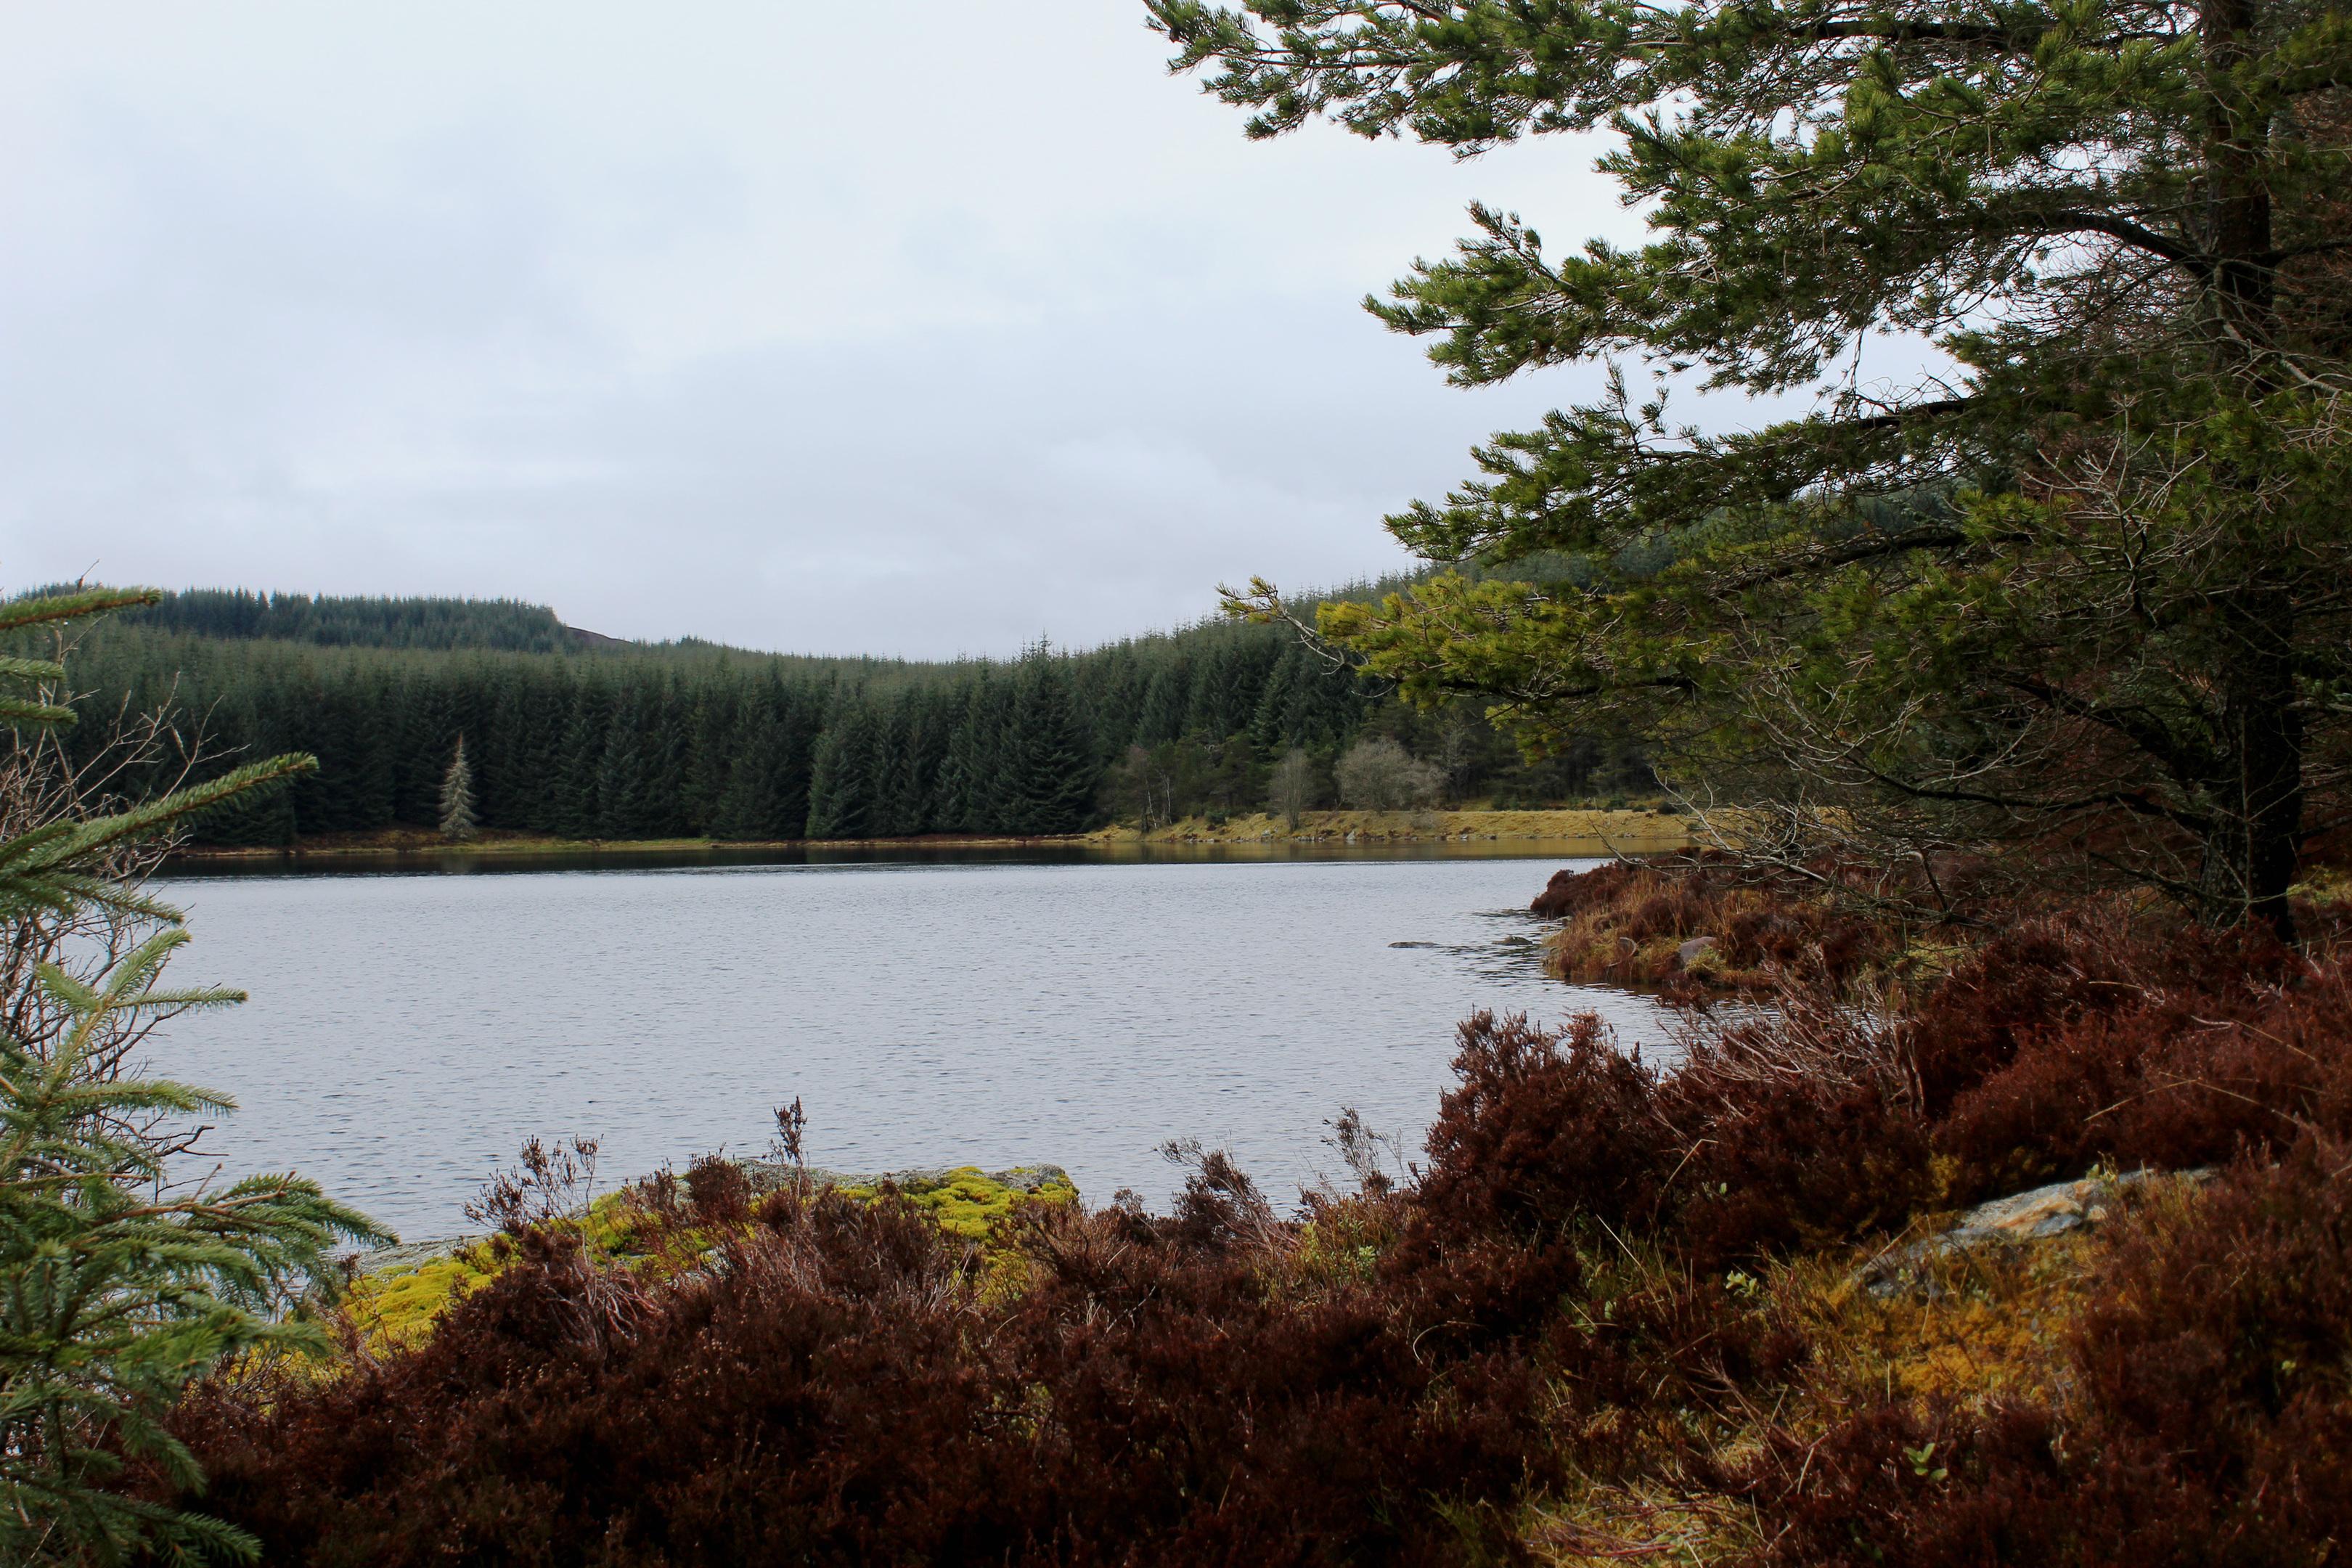 Loch Kennard